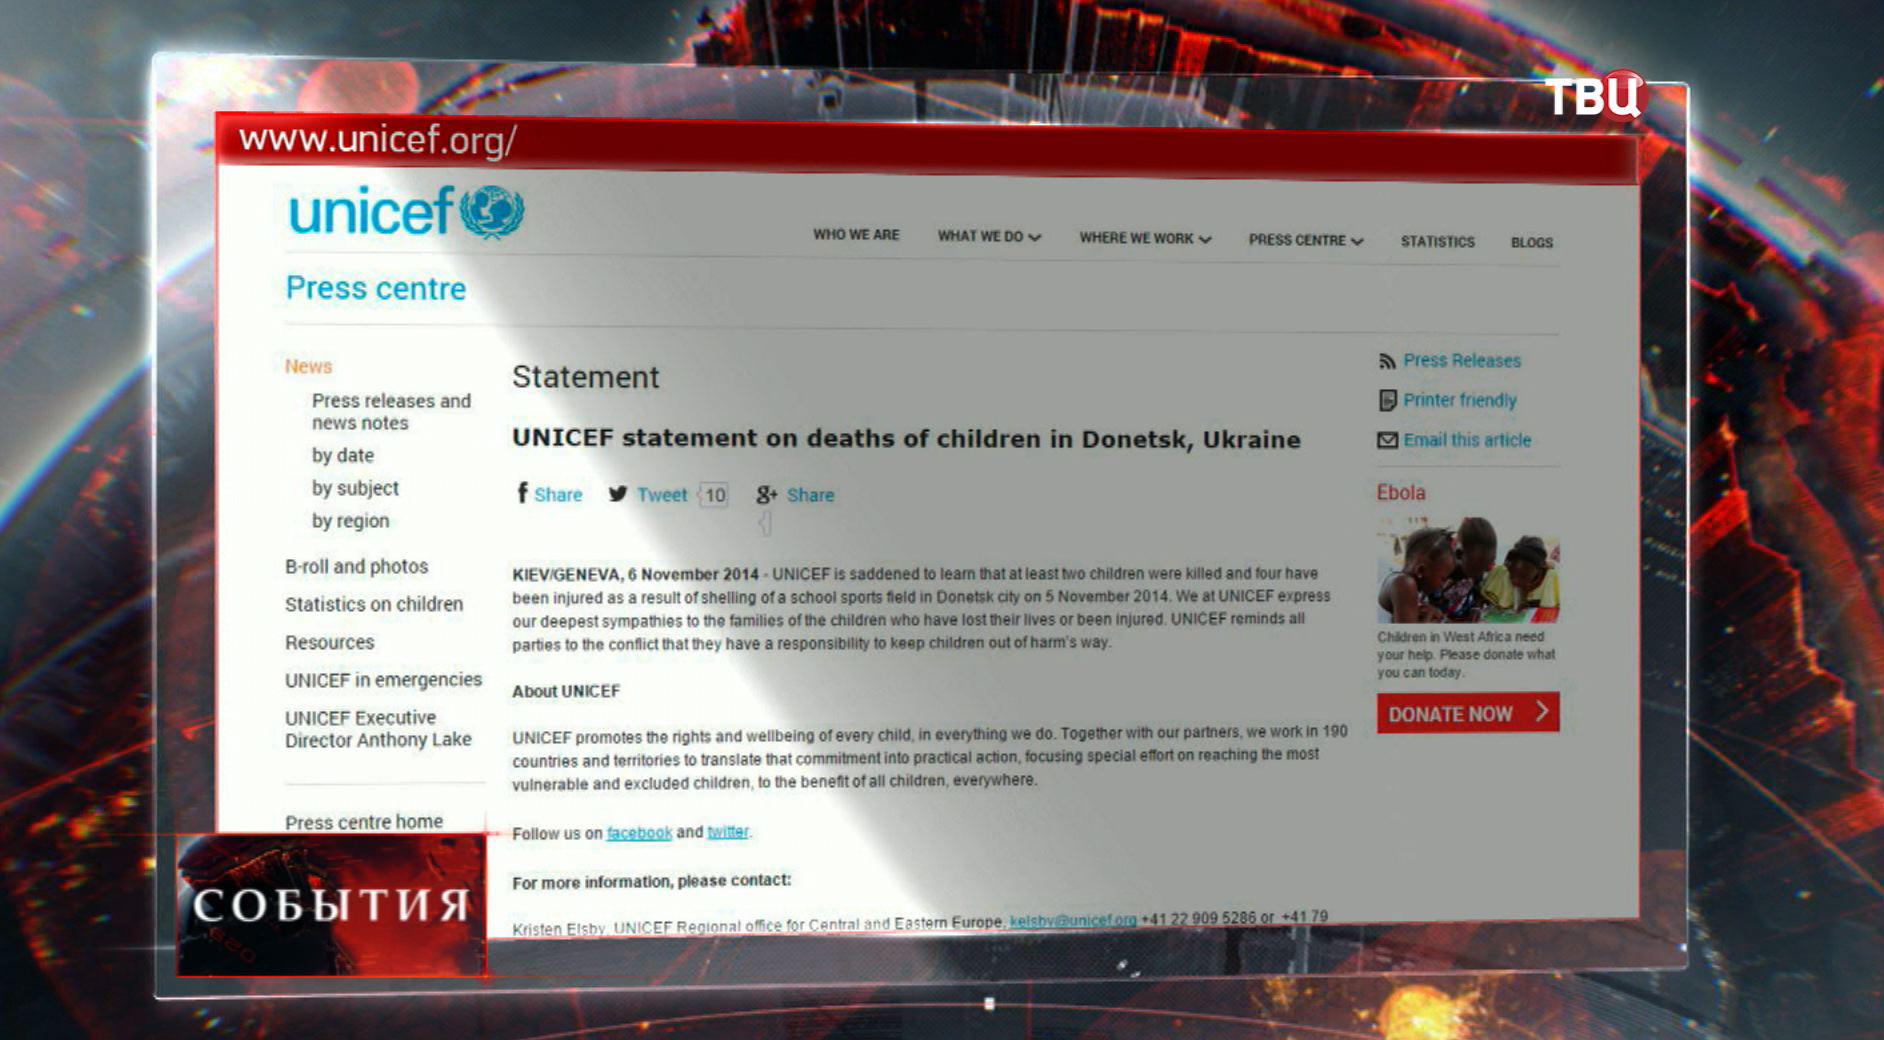 Сайт www.unicef.org/